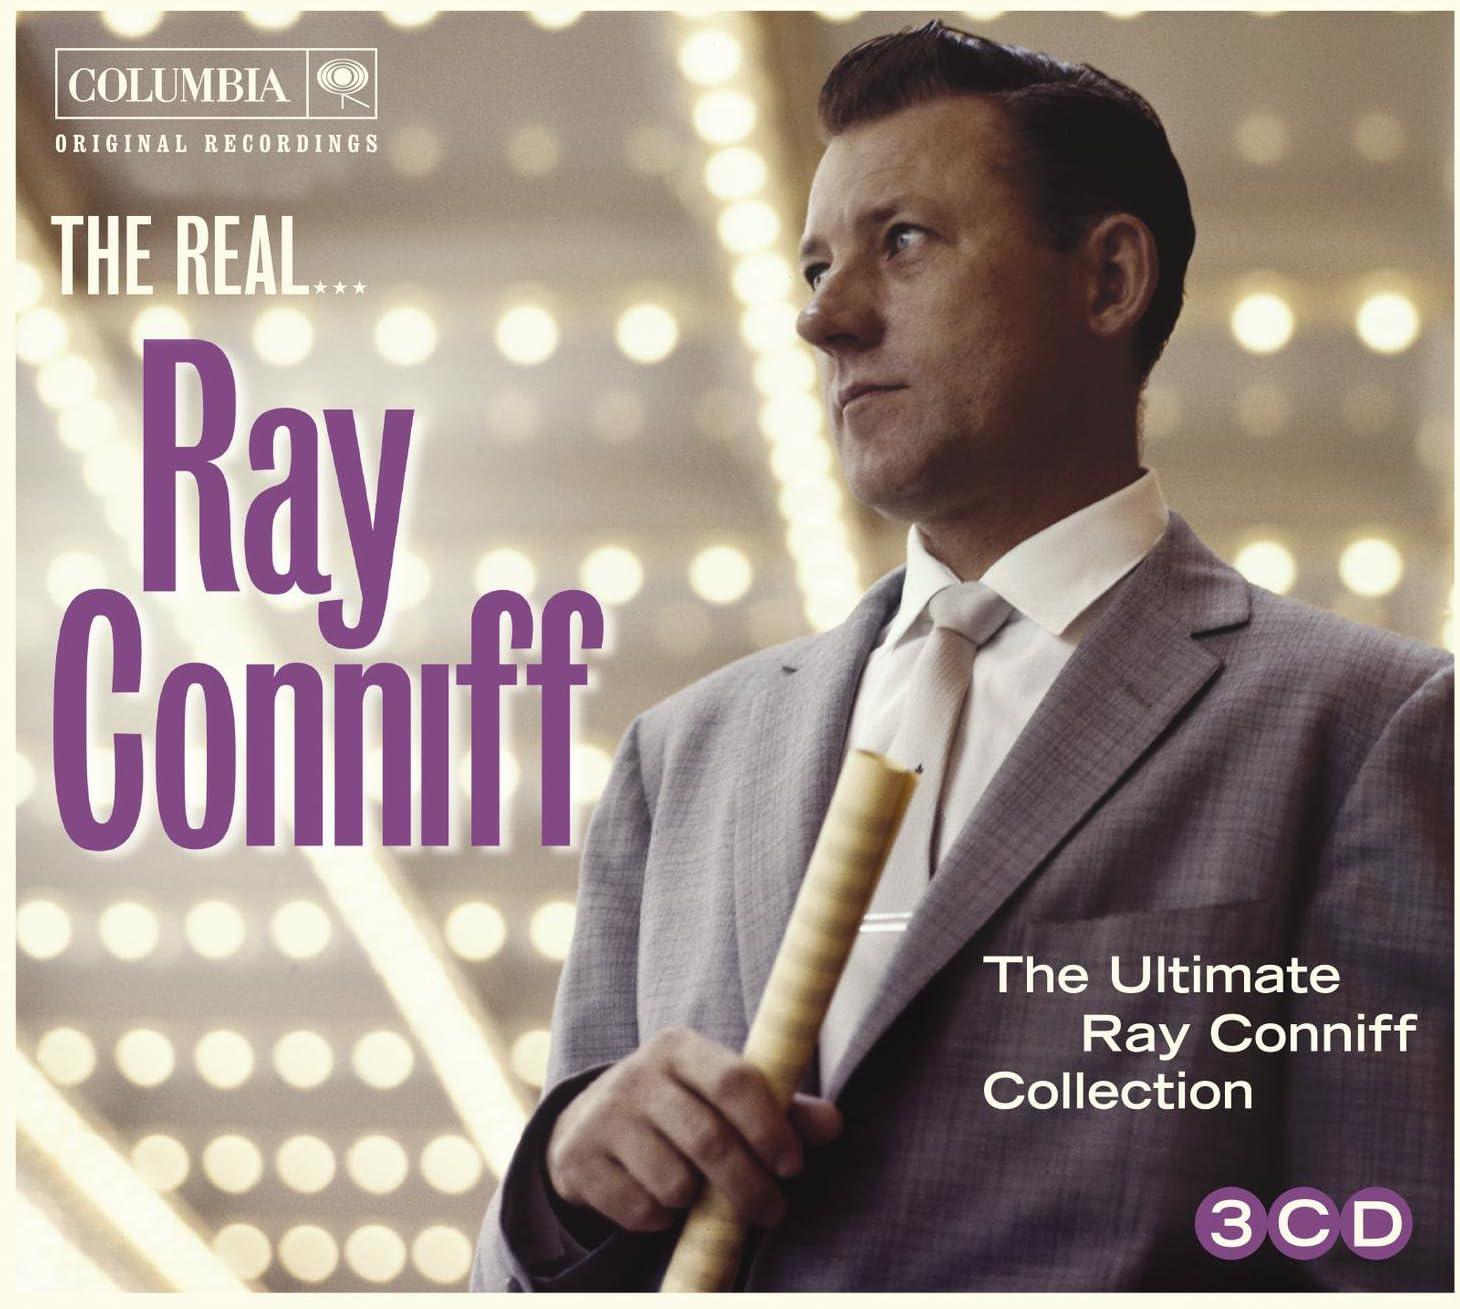 Amazon   Realray Conniff   Conniff, Ray   イージーリスニング   音楽